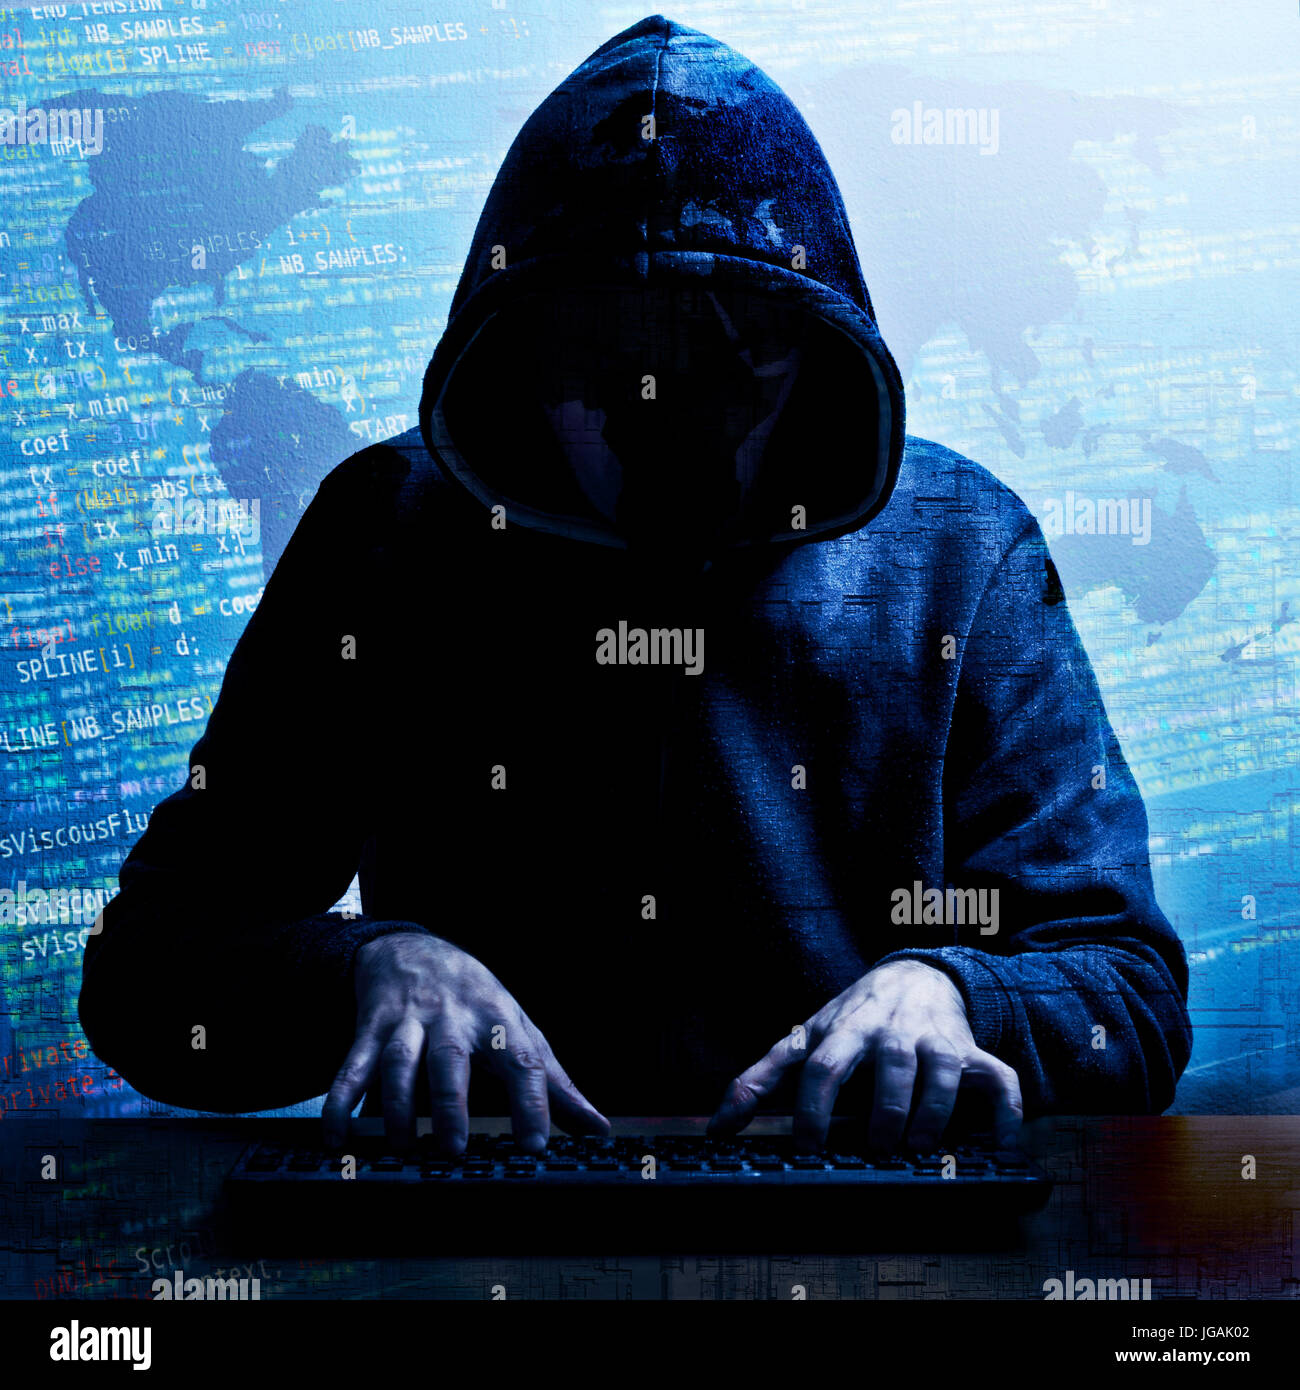 Hacker Aktivität Gesamtkonzept Stockbild